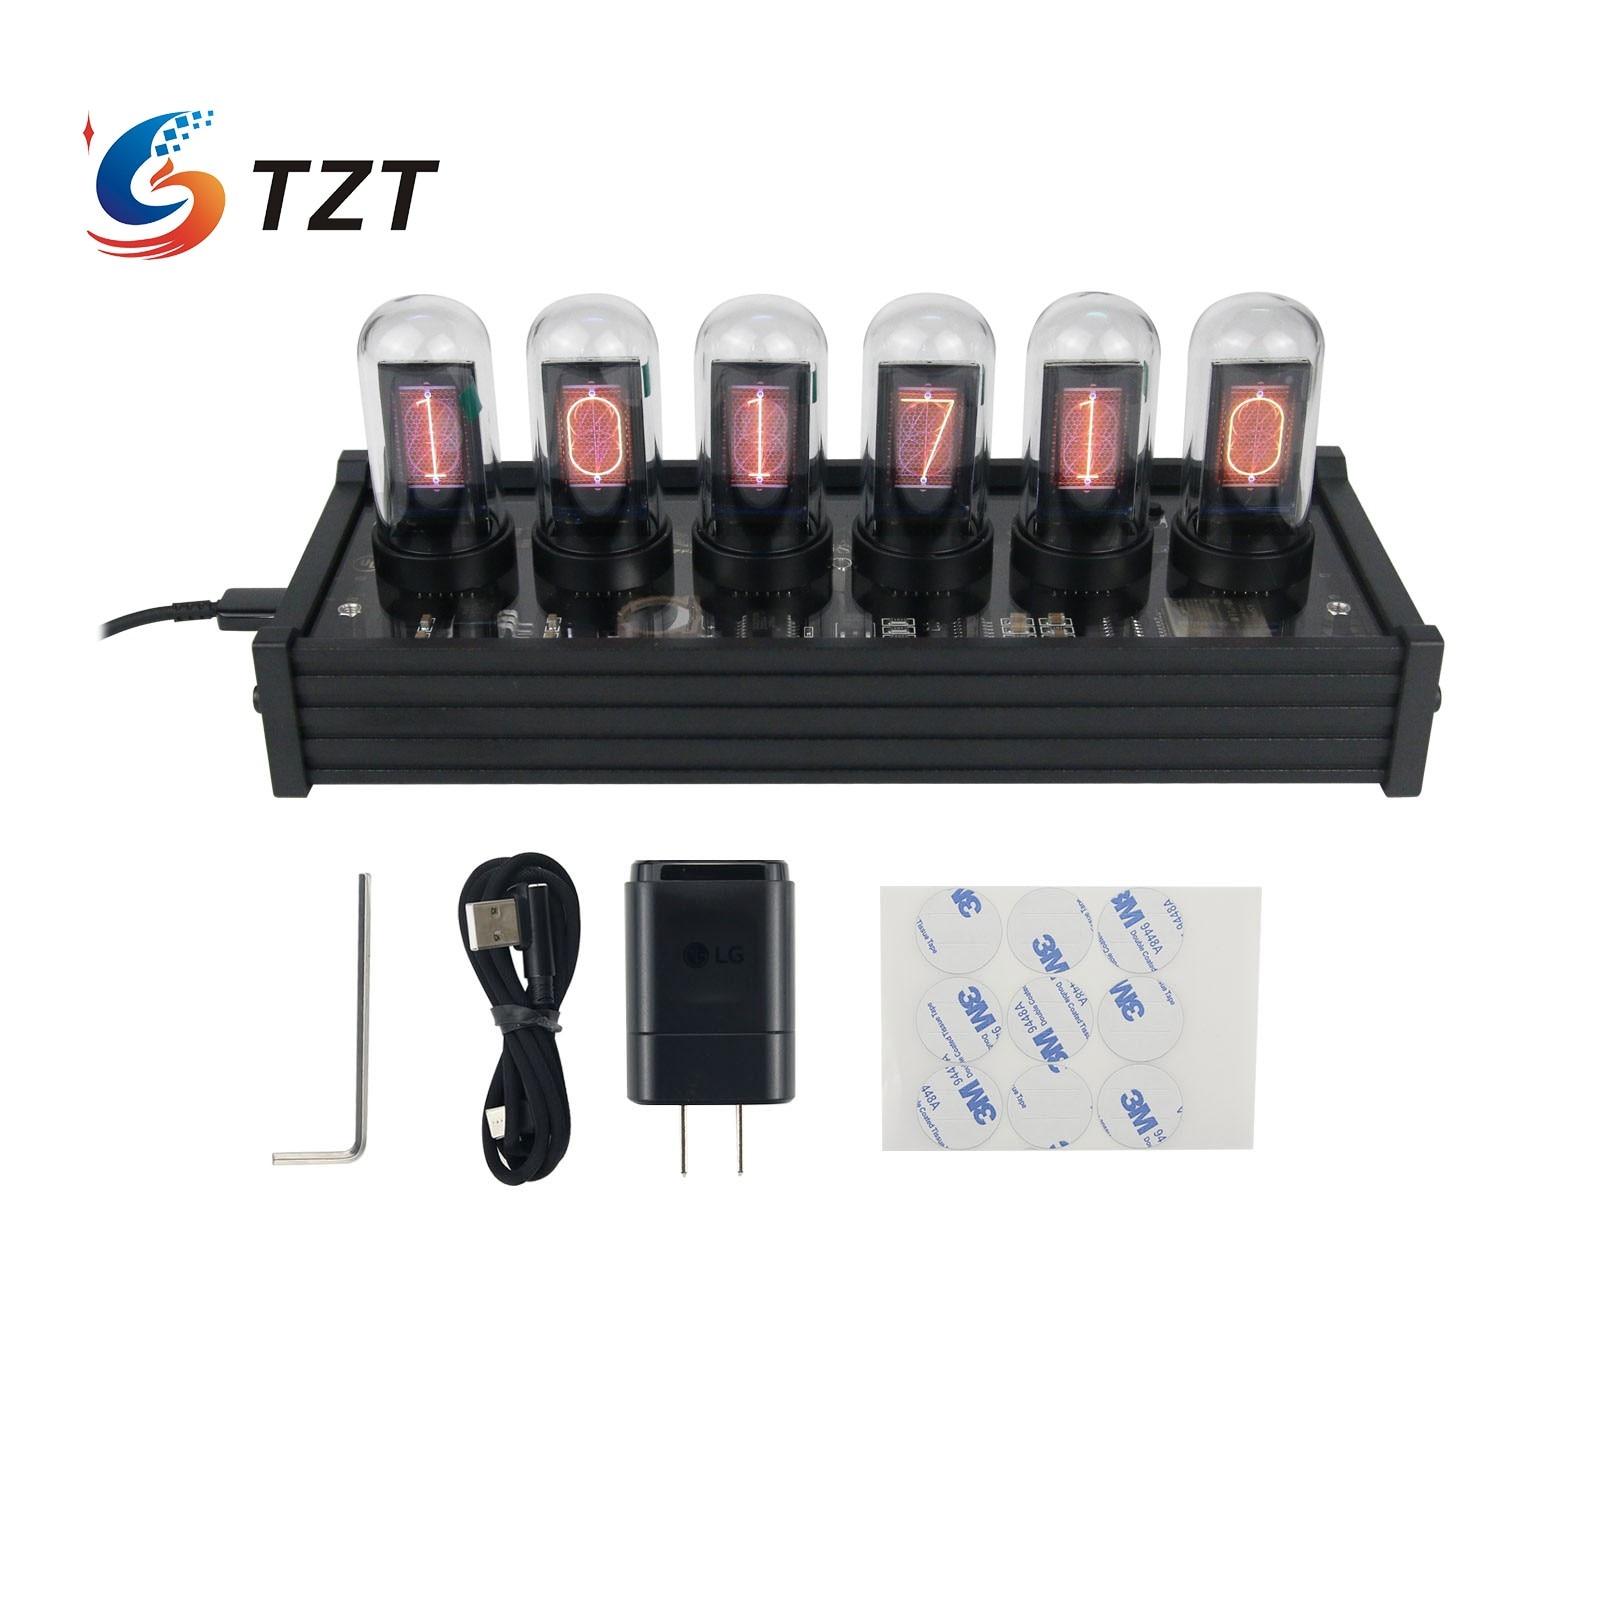 TZT EleksTube IPS RGB Nixie أنبوب ساعة توهج أنبوب ساعة مخصصة الطلب أنماط الإبداعية ديكور الهدايا